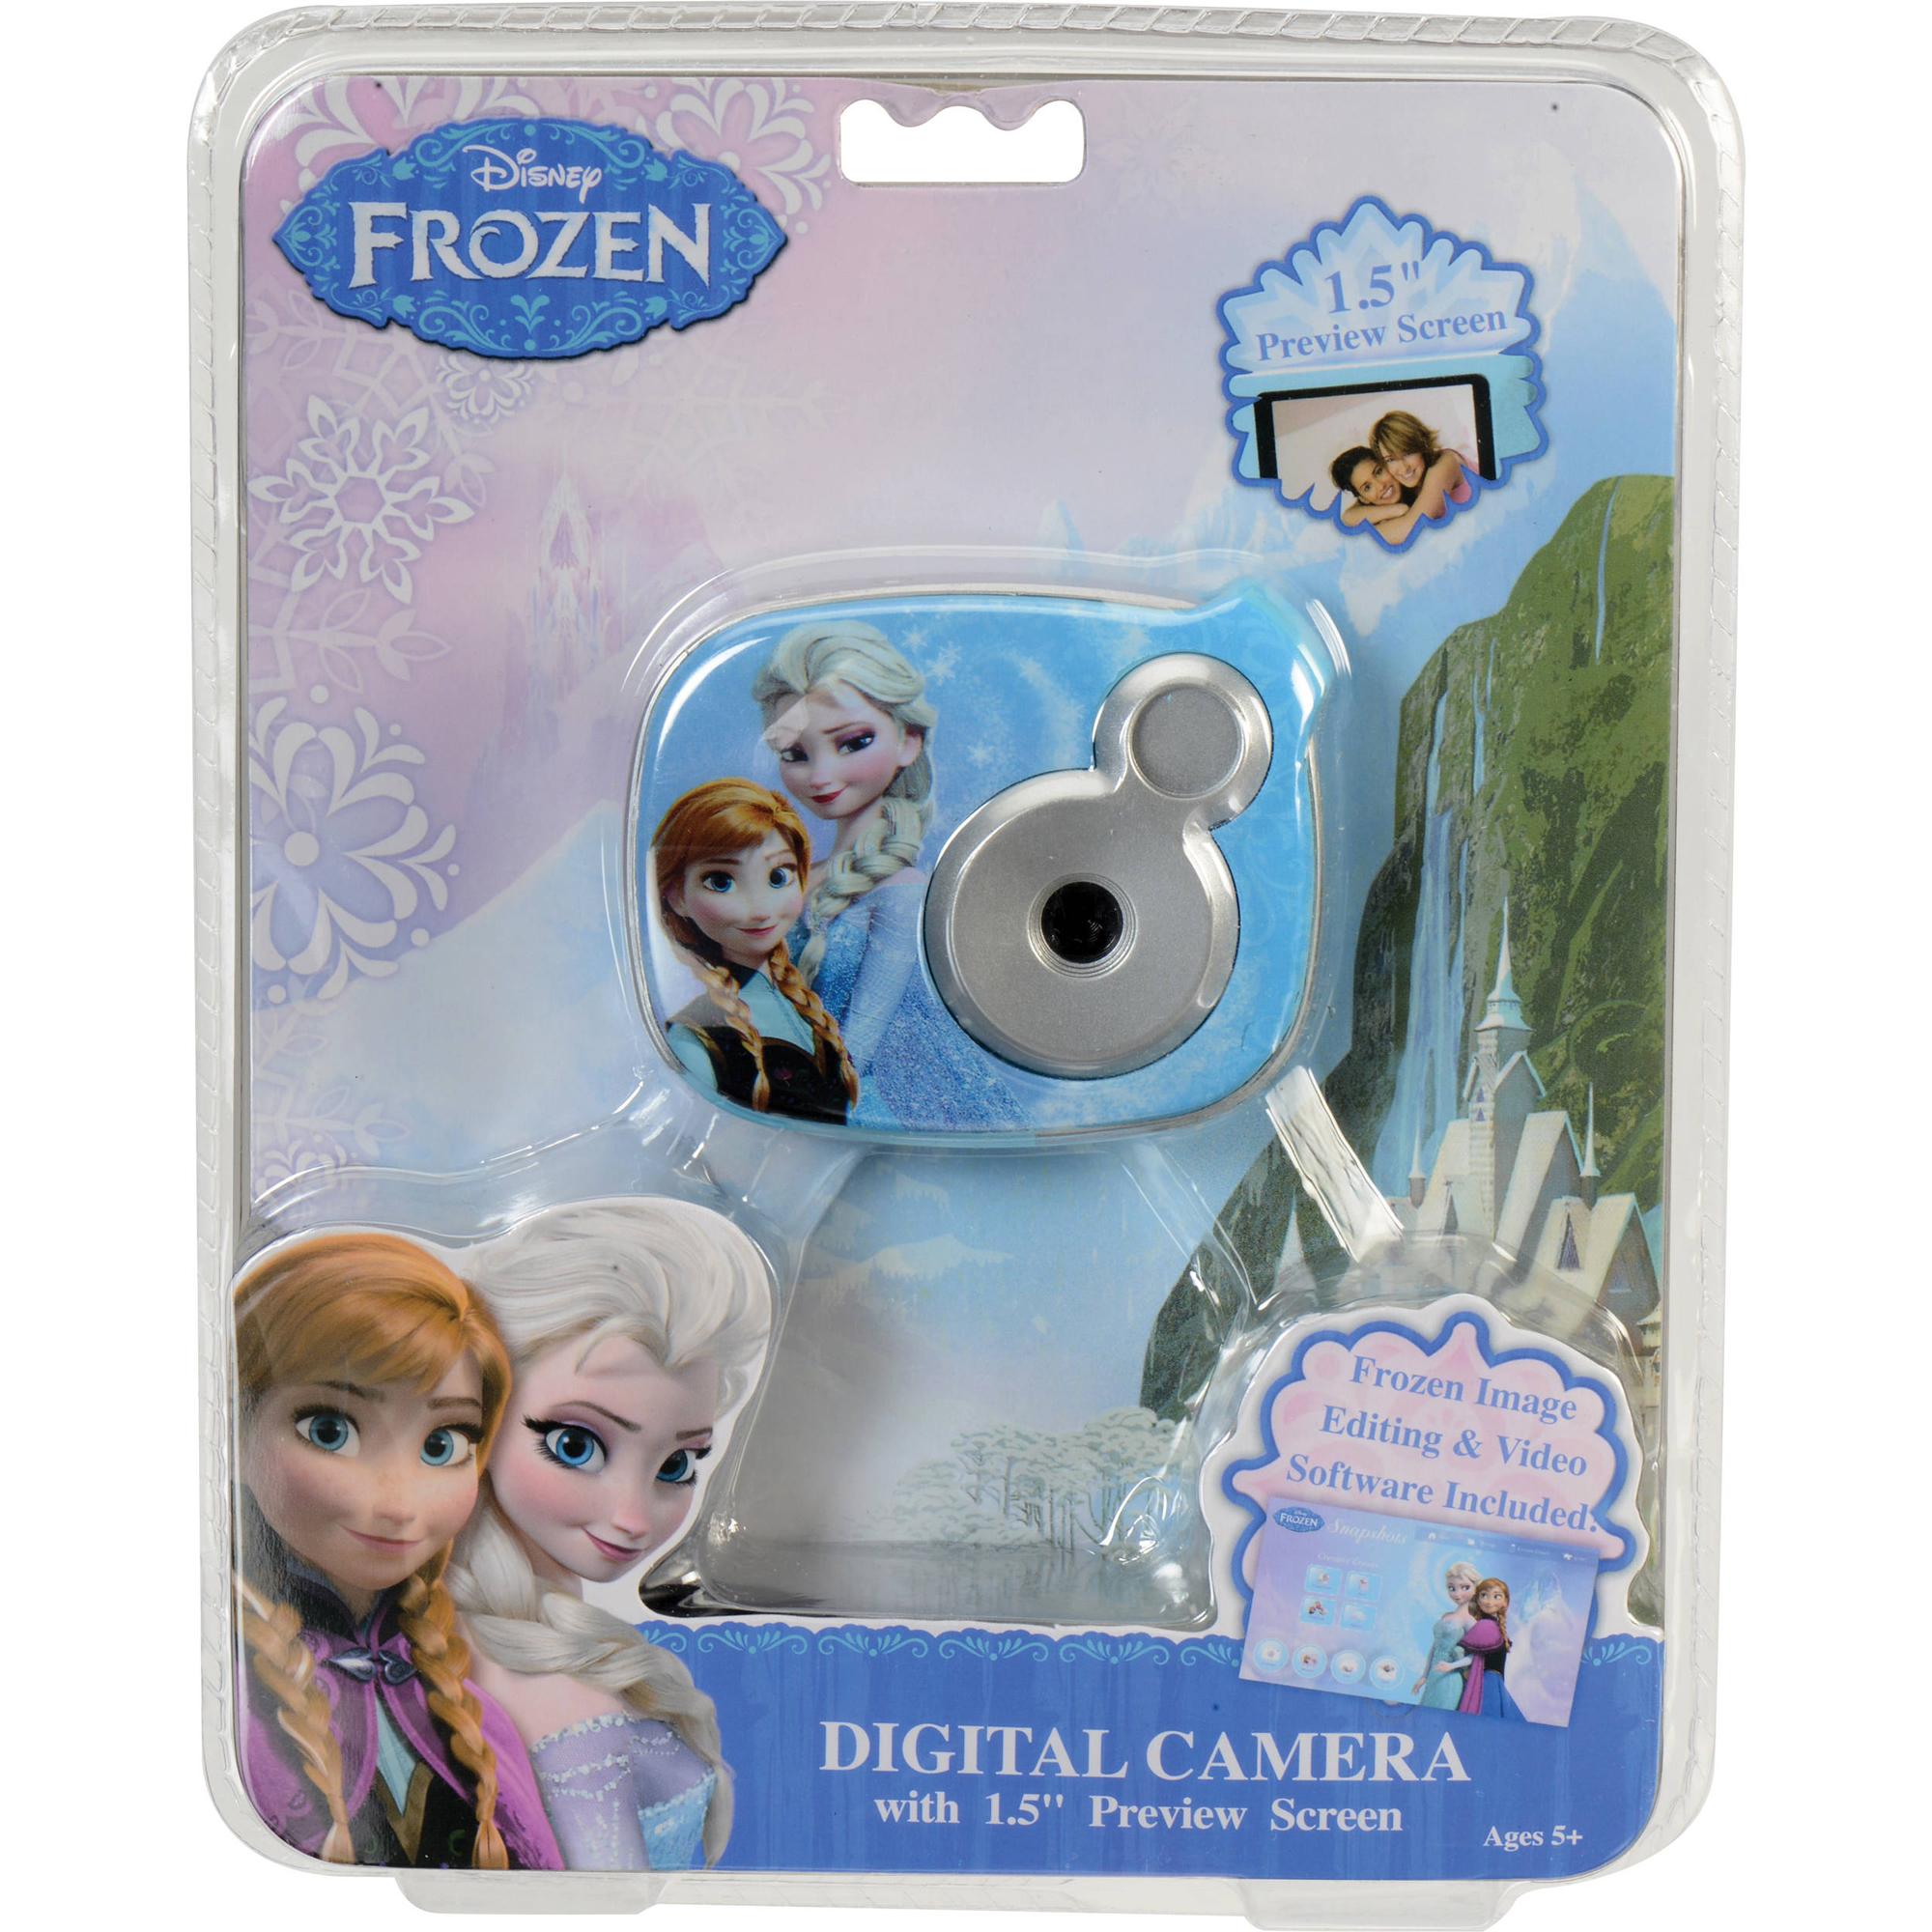 Cameras For Kids Bh Explora Circuit Board Plastic Iphone 5 5s Phone Case Baby N Toddler Vivitar Frozen 21 Mp Digital Camera